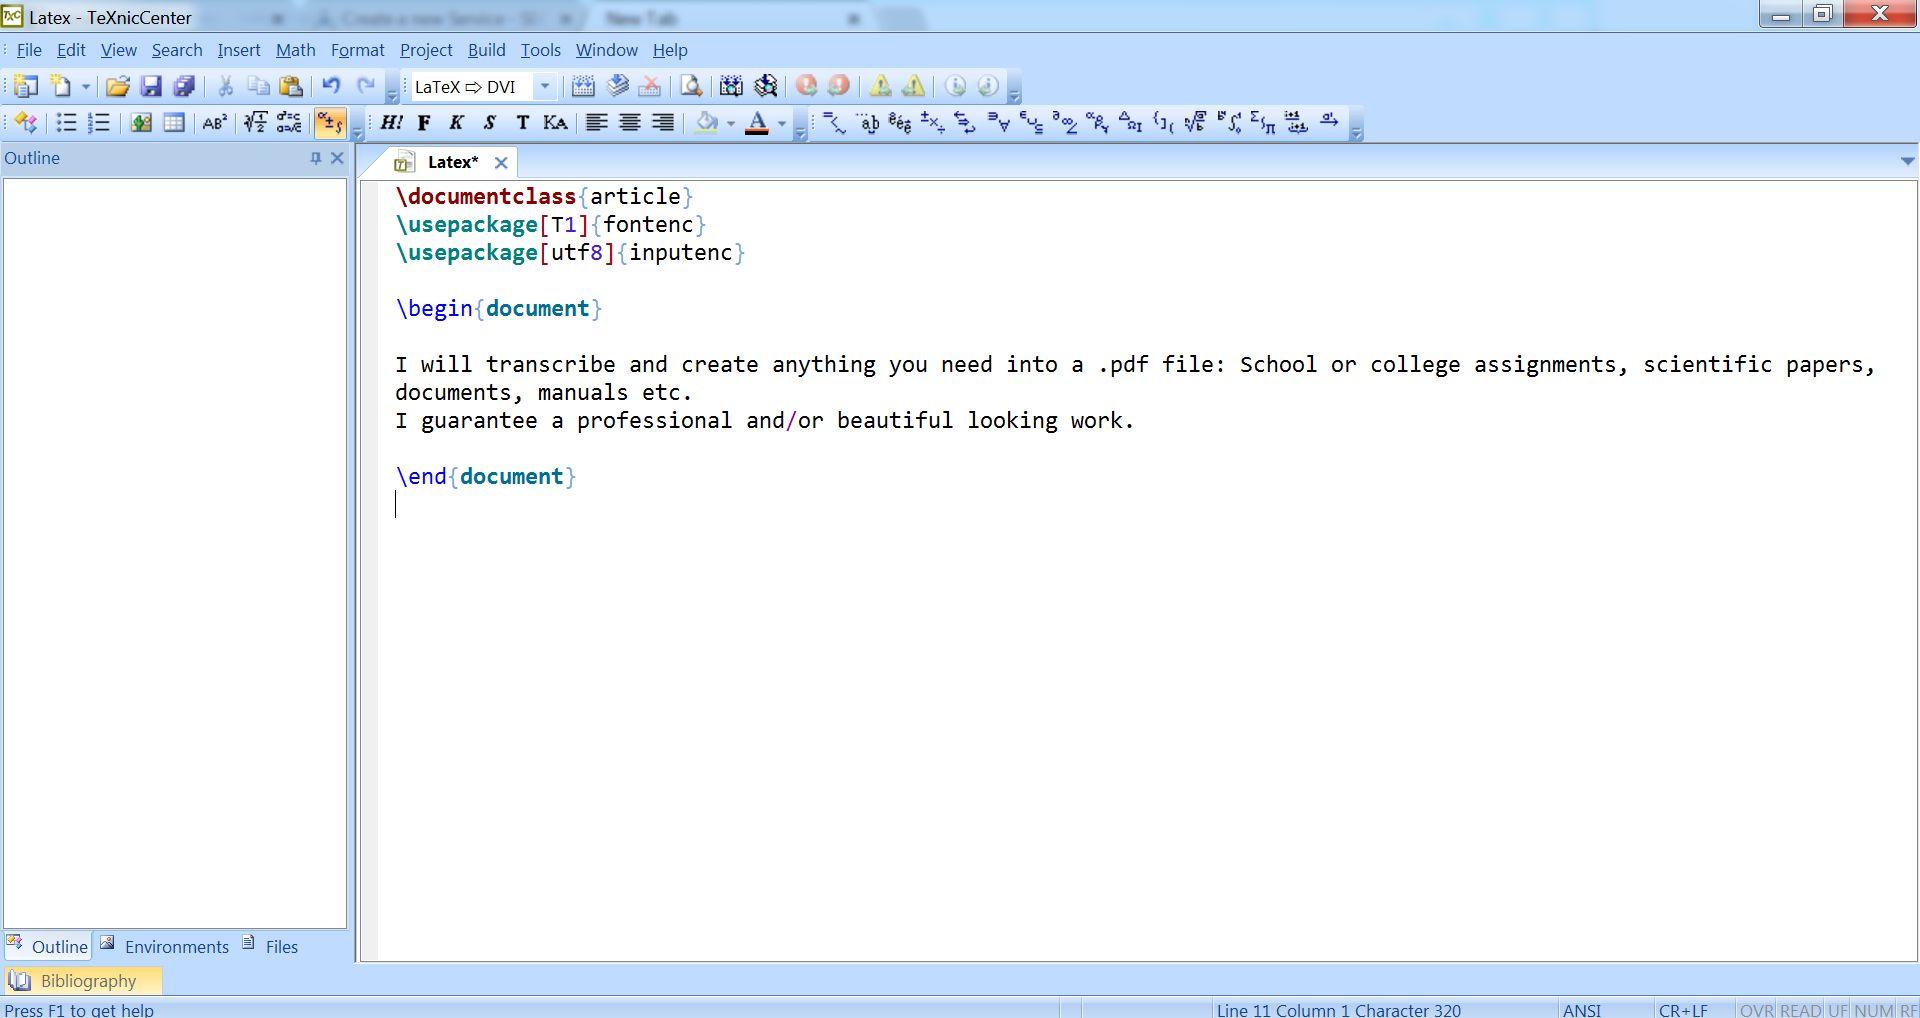 Transcribe,convert and create .pdf files using LaTeX